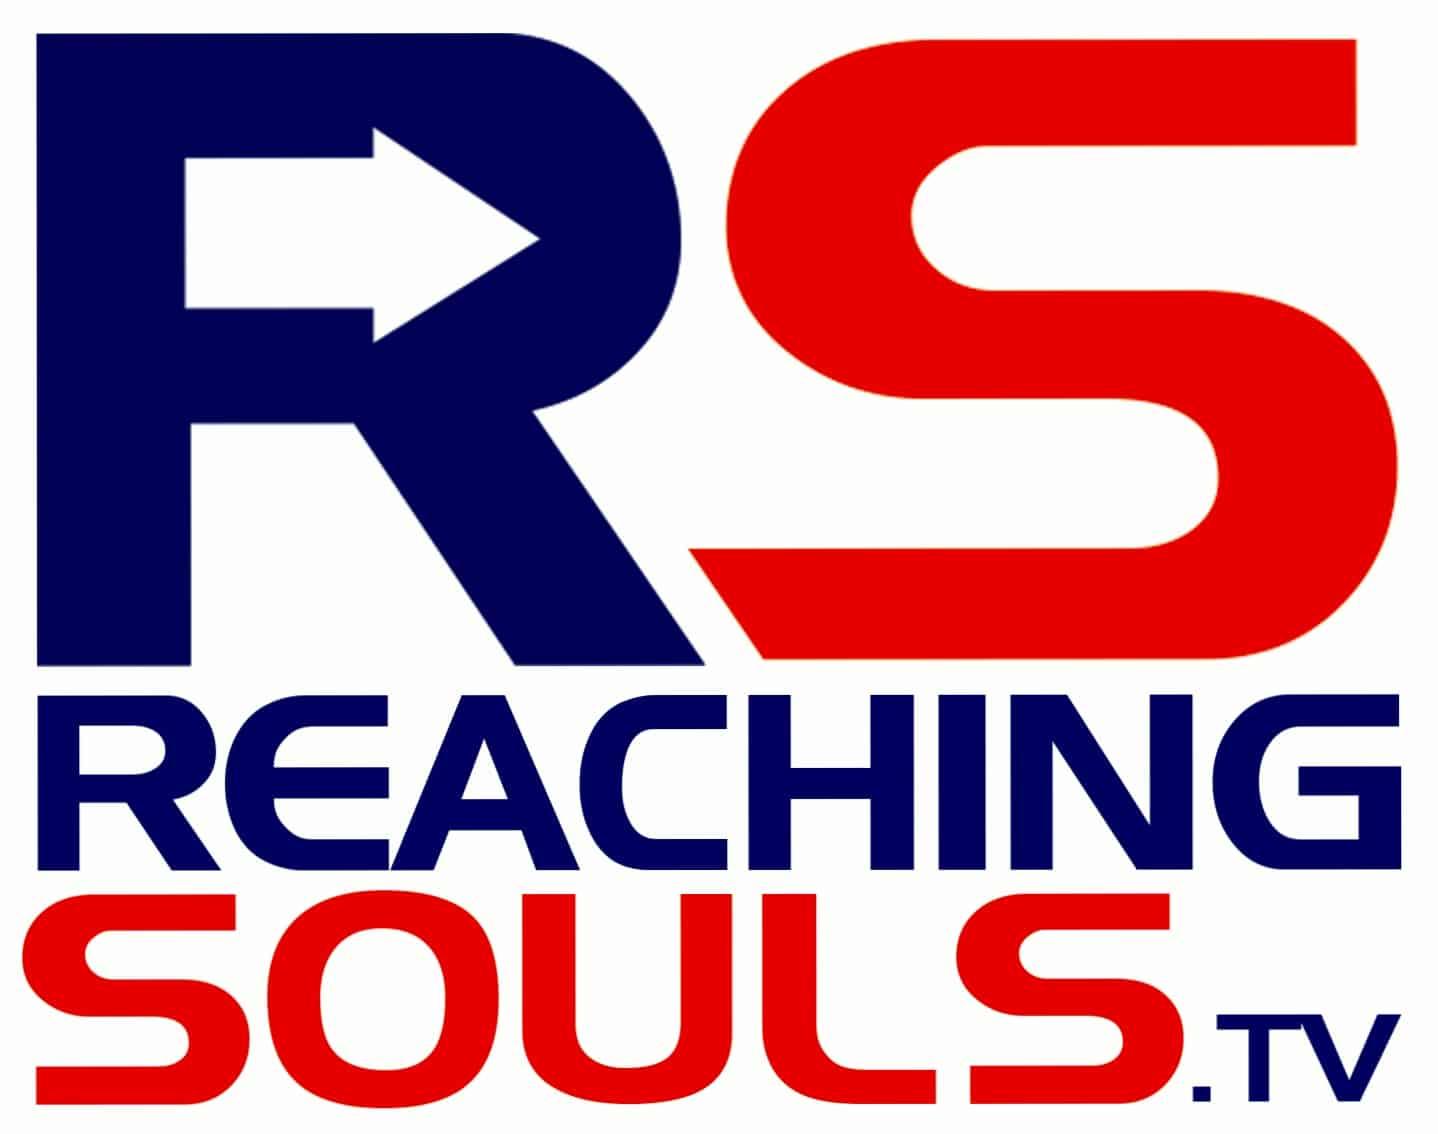 Reaching Souls International